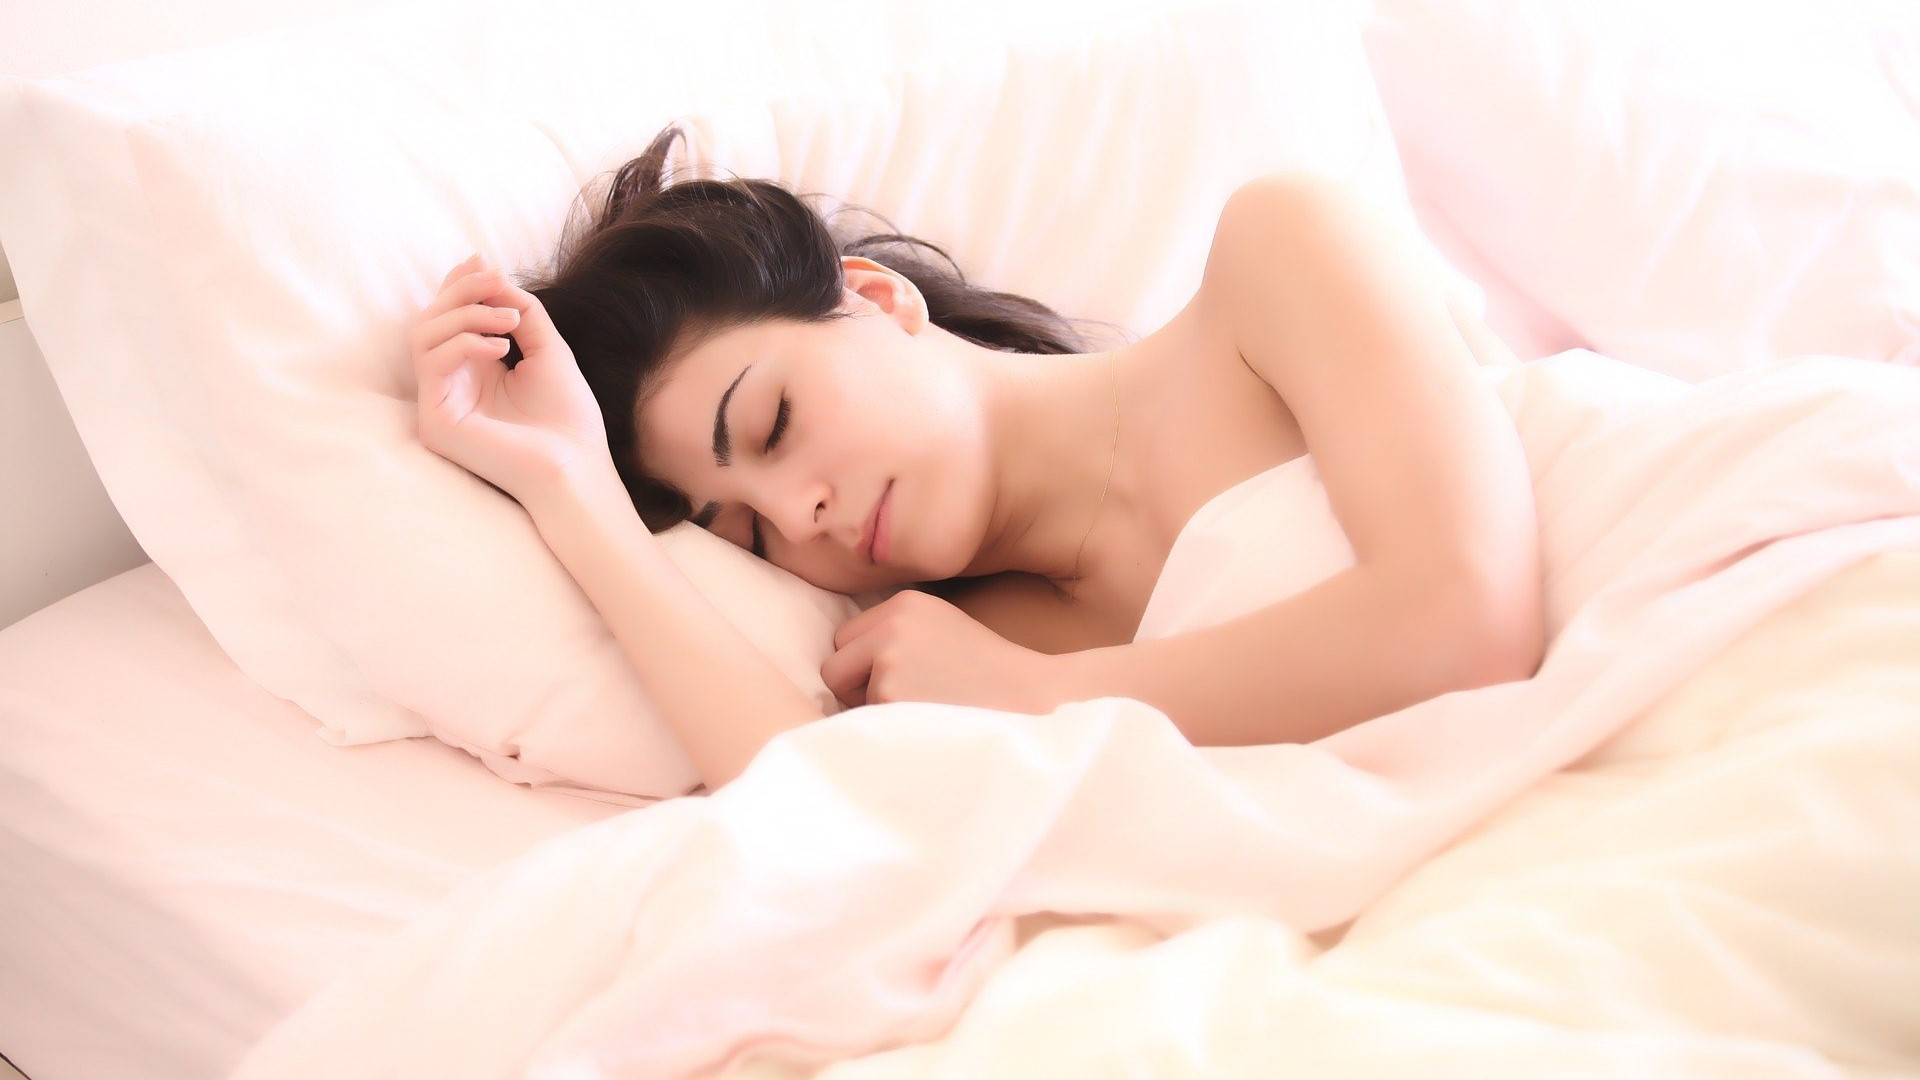 Slapende vrouw, moe